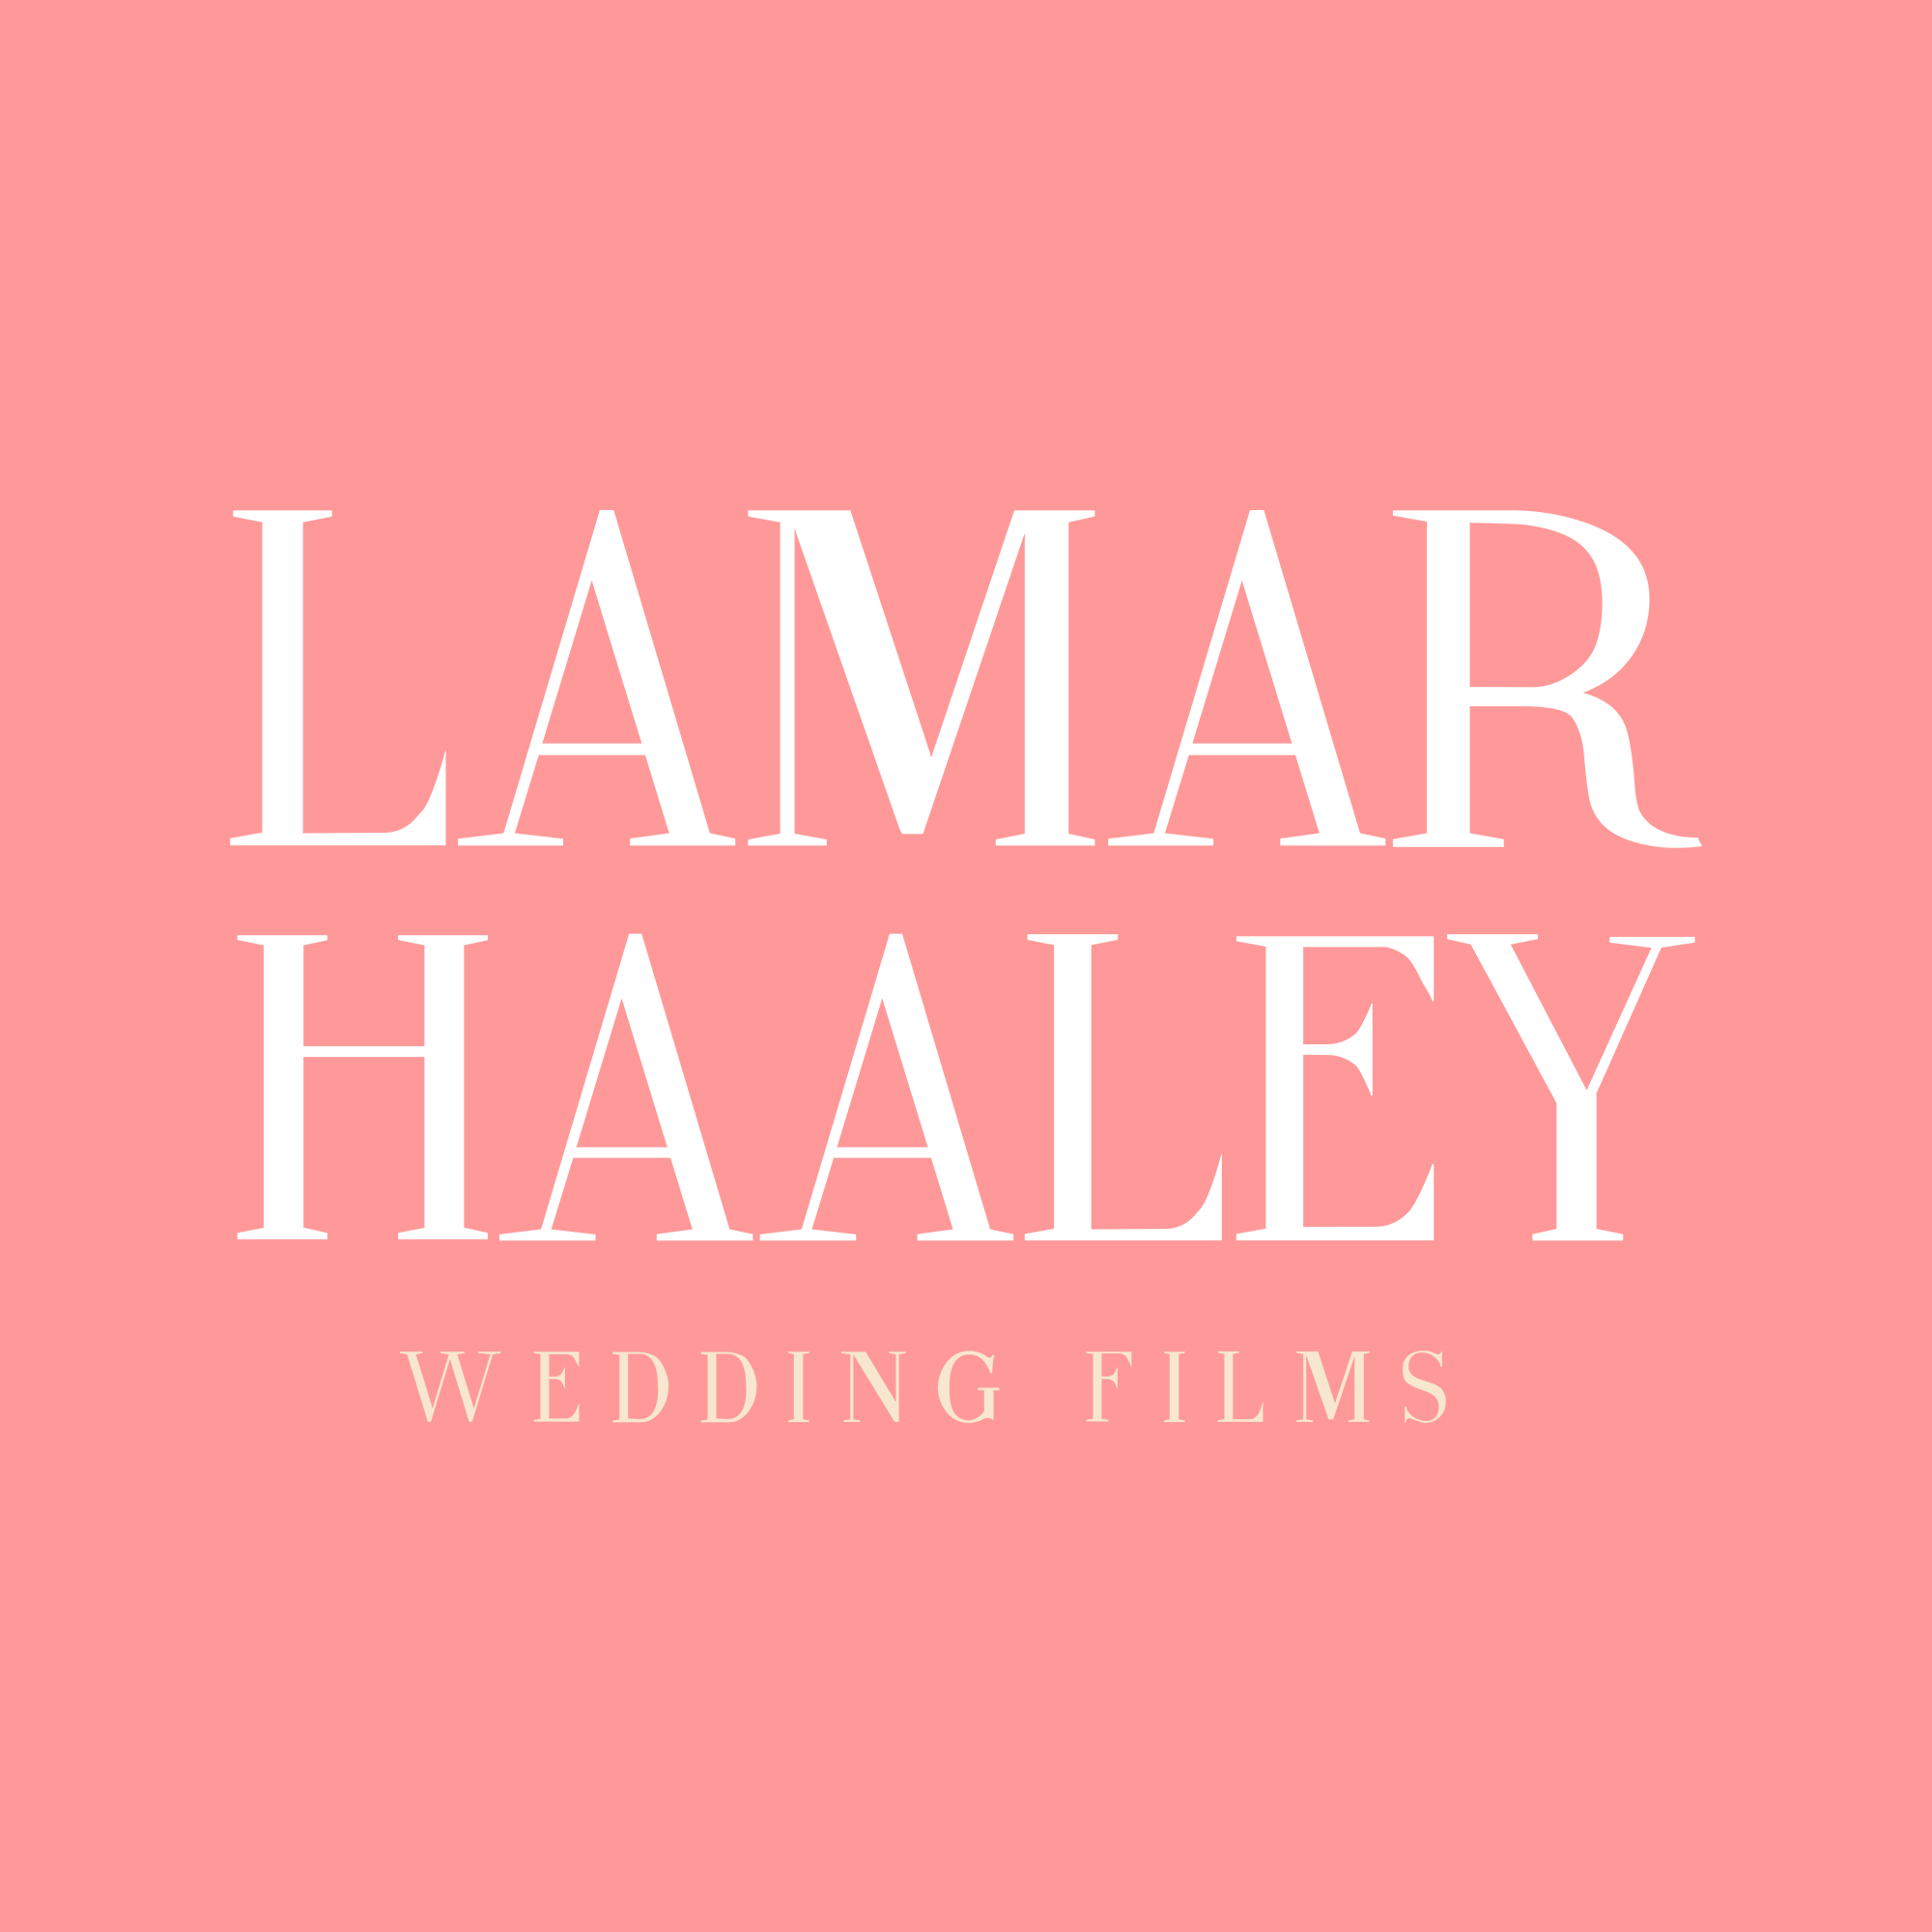 Lamar Haaley Wedding Films - Facebook Display Photo 3.png